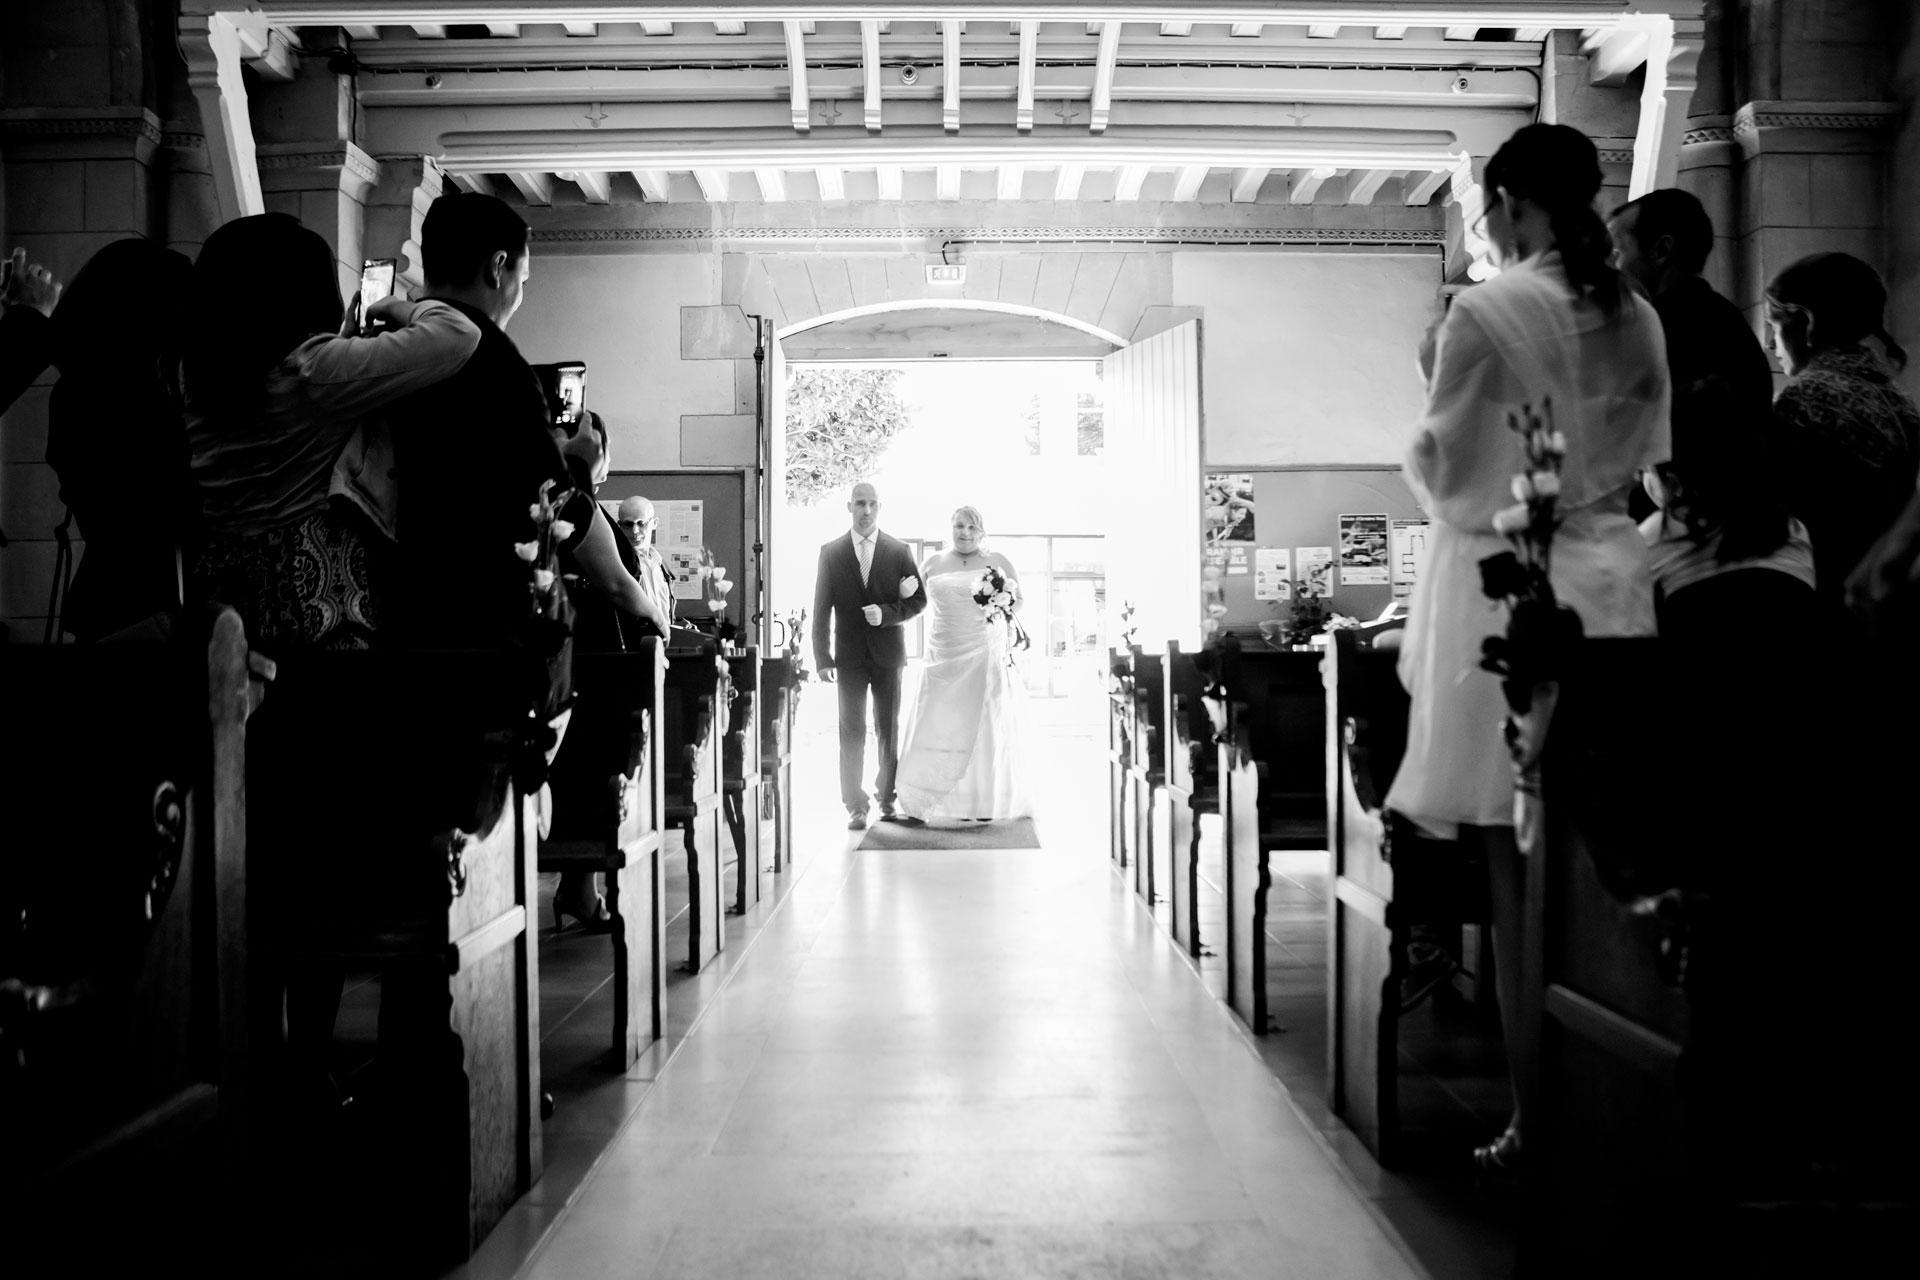 mariage-elodie-wilson-26